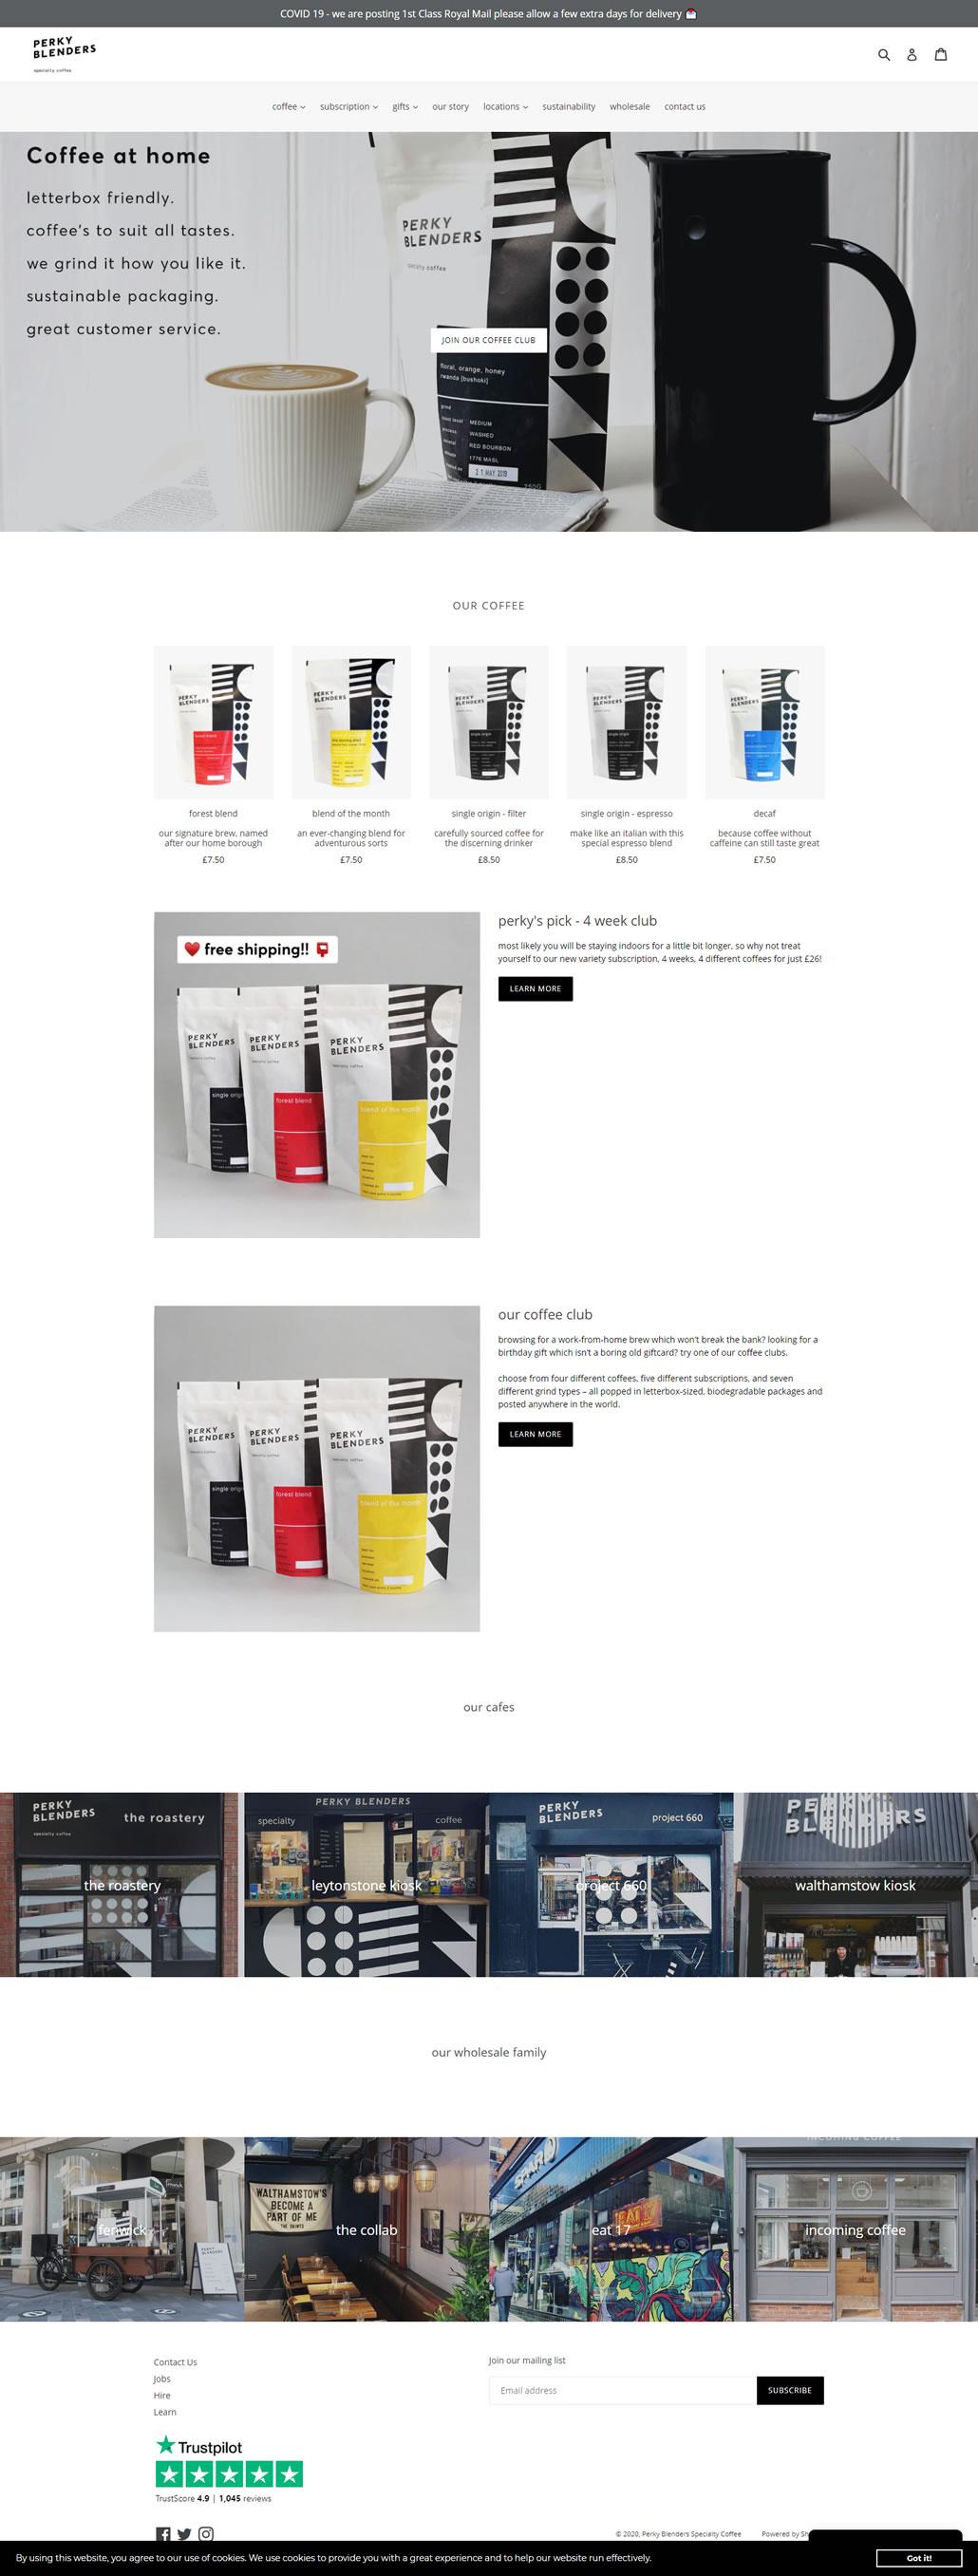 Perky Blenders built using Shopify, web design by Convoy Media